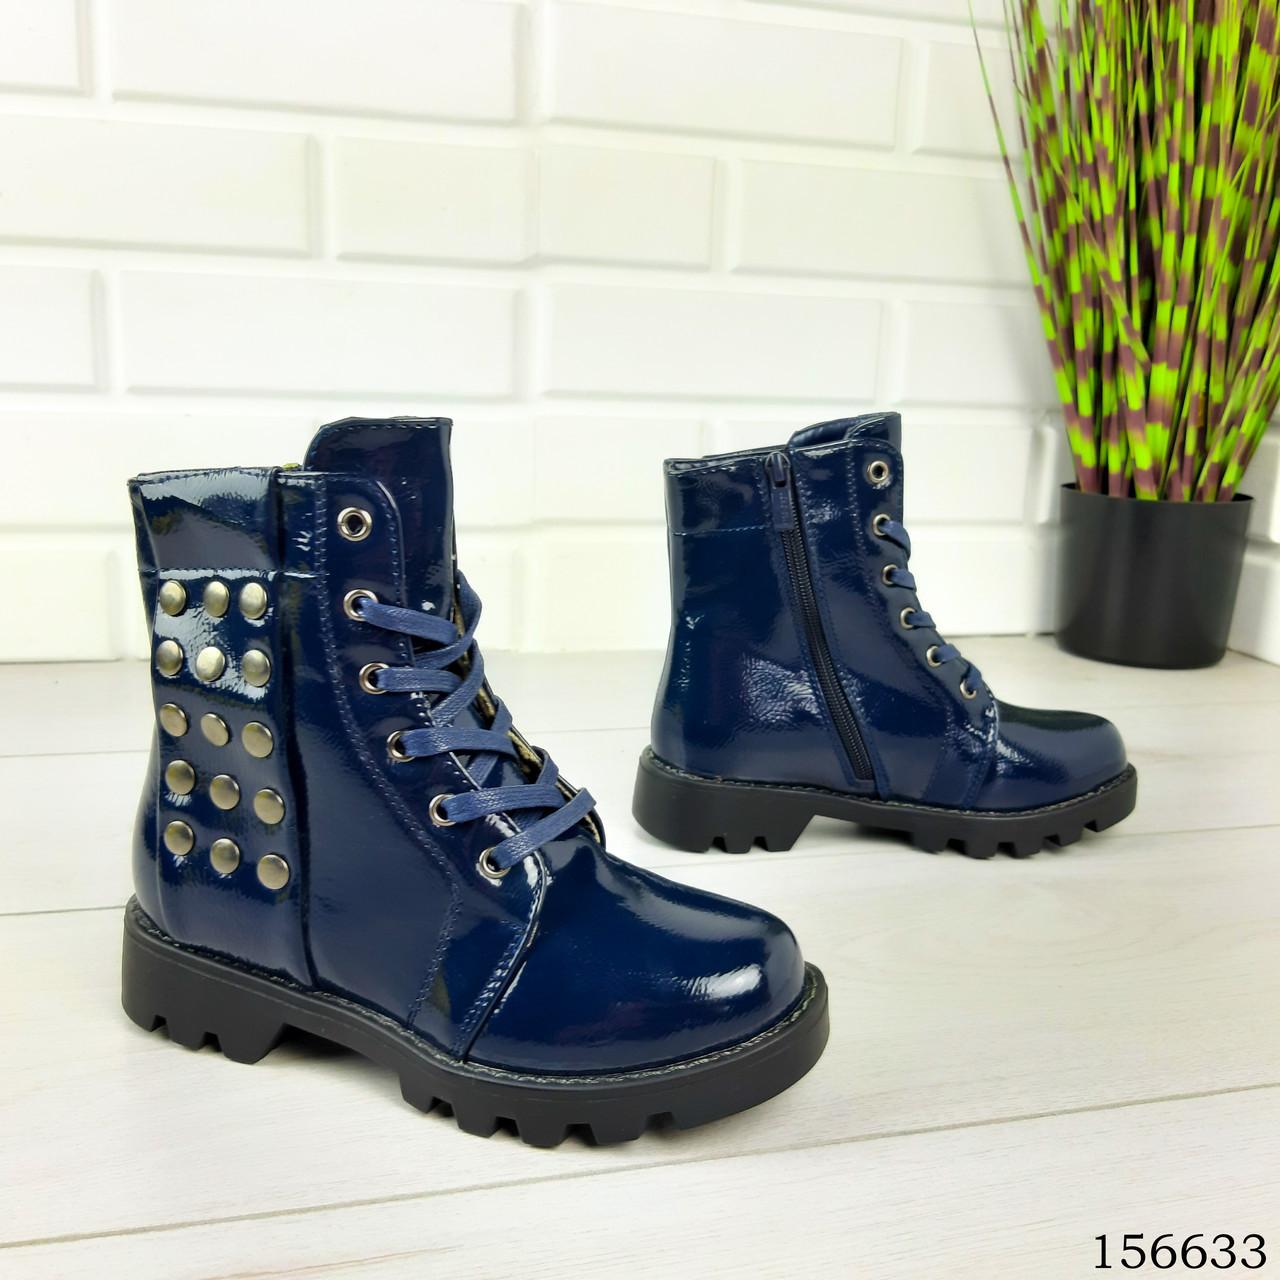 "Ботинки детские синие на шнурках ""Werex"" эко кожа деми"